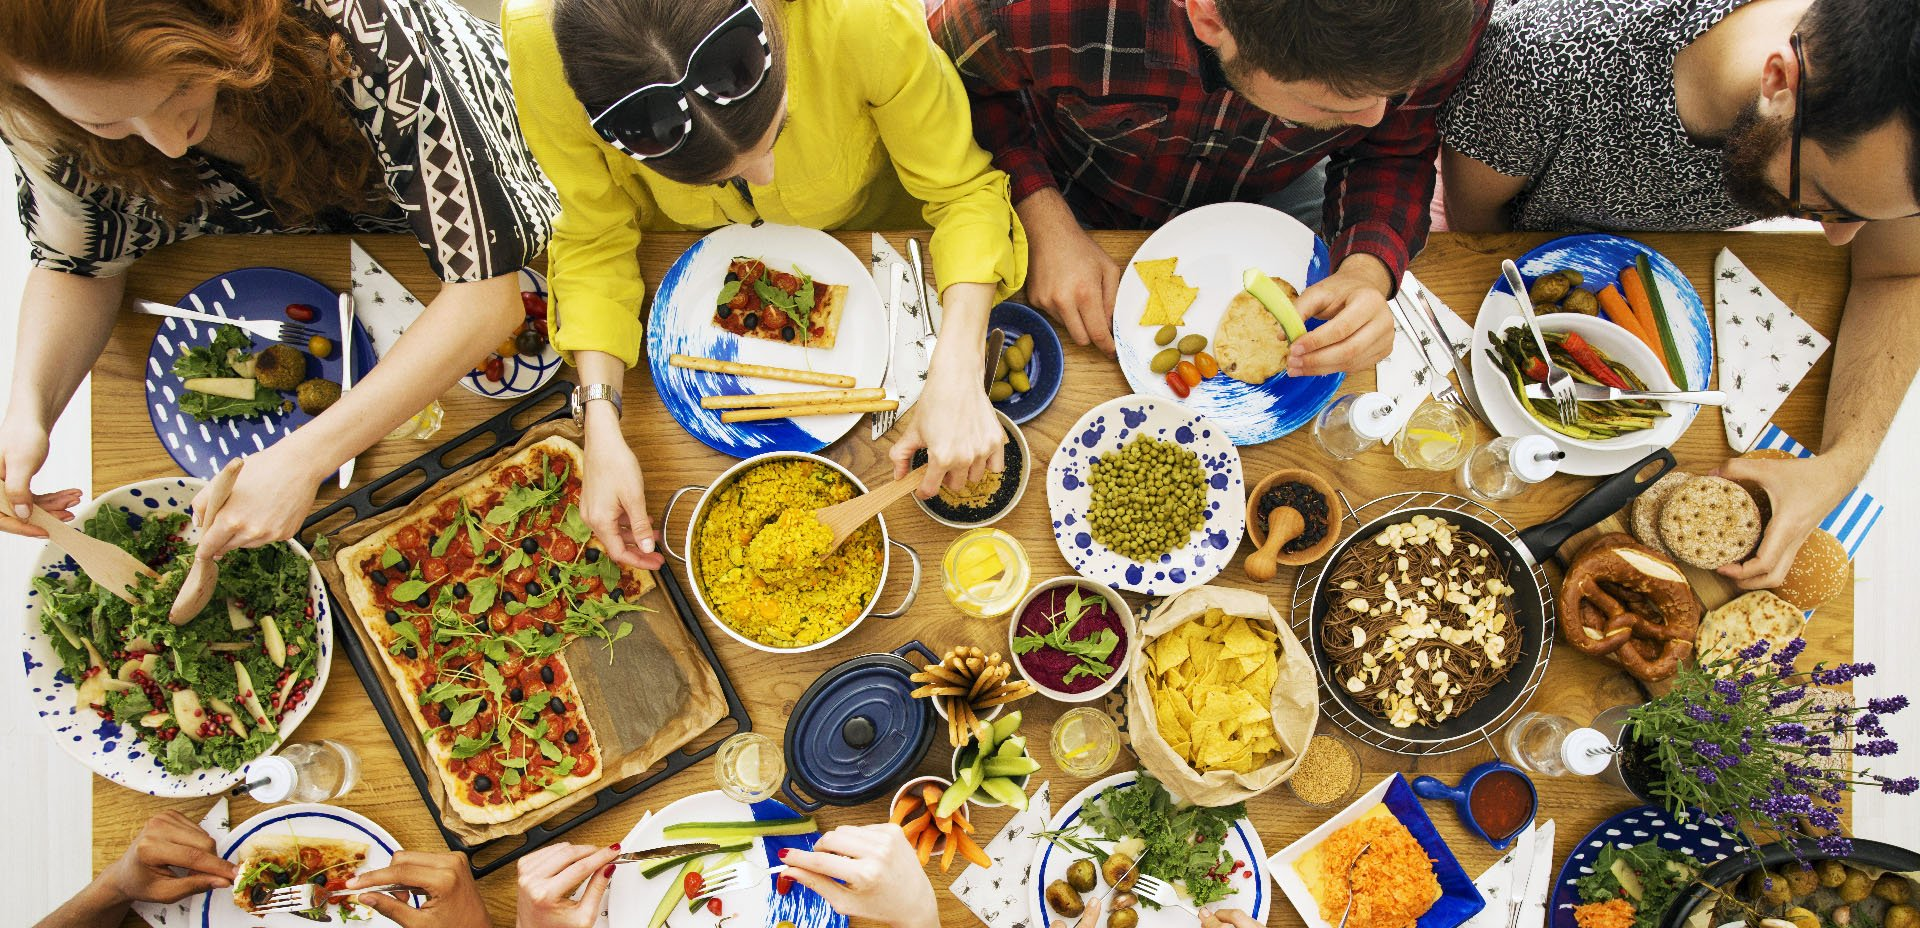 Dieta vegana e vegetariana: danni alle ossa?